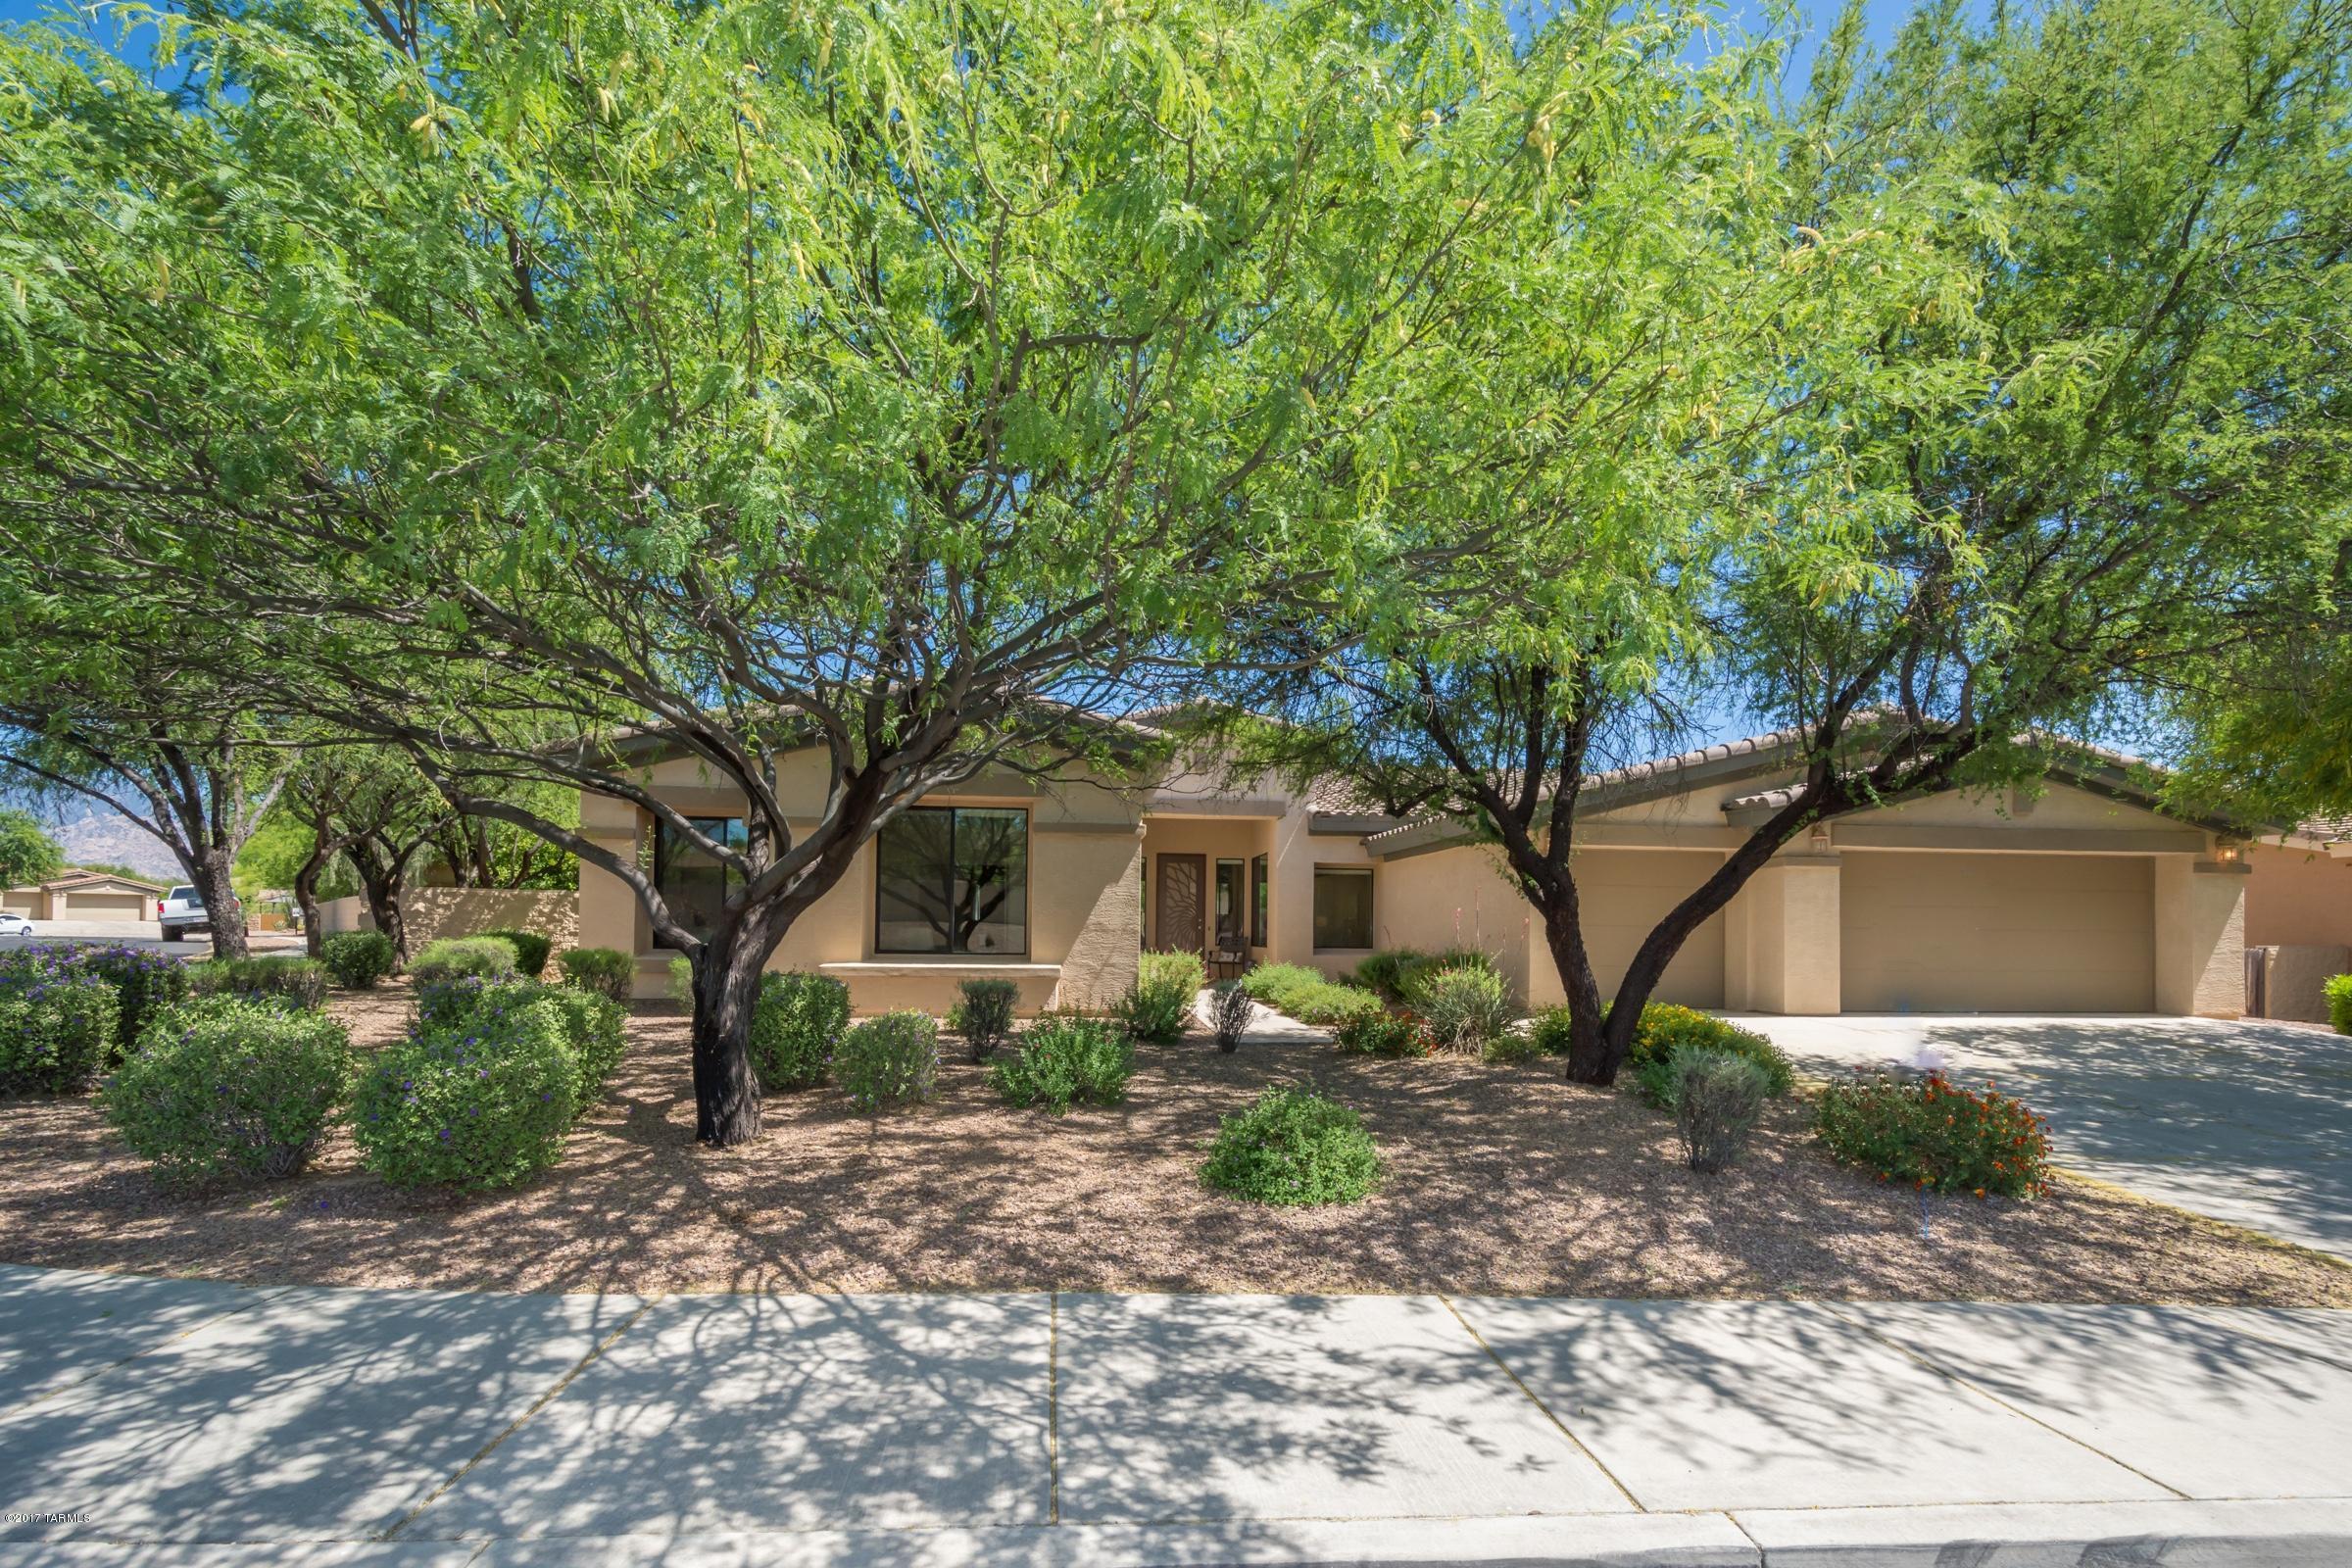 11940 N Verch Way, Tucson, AZ 85737